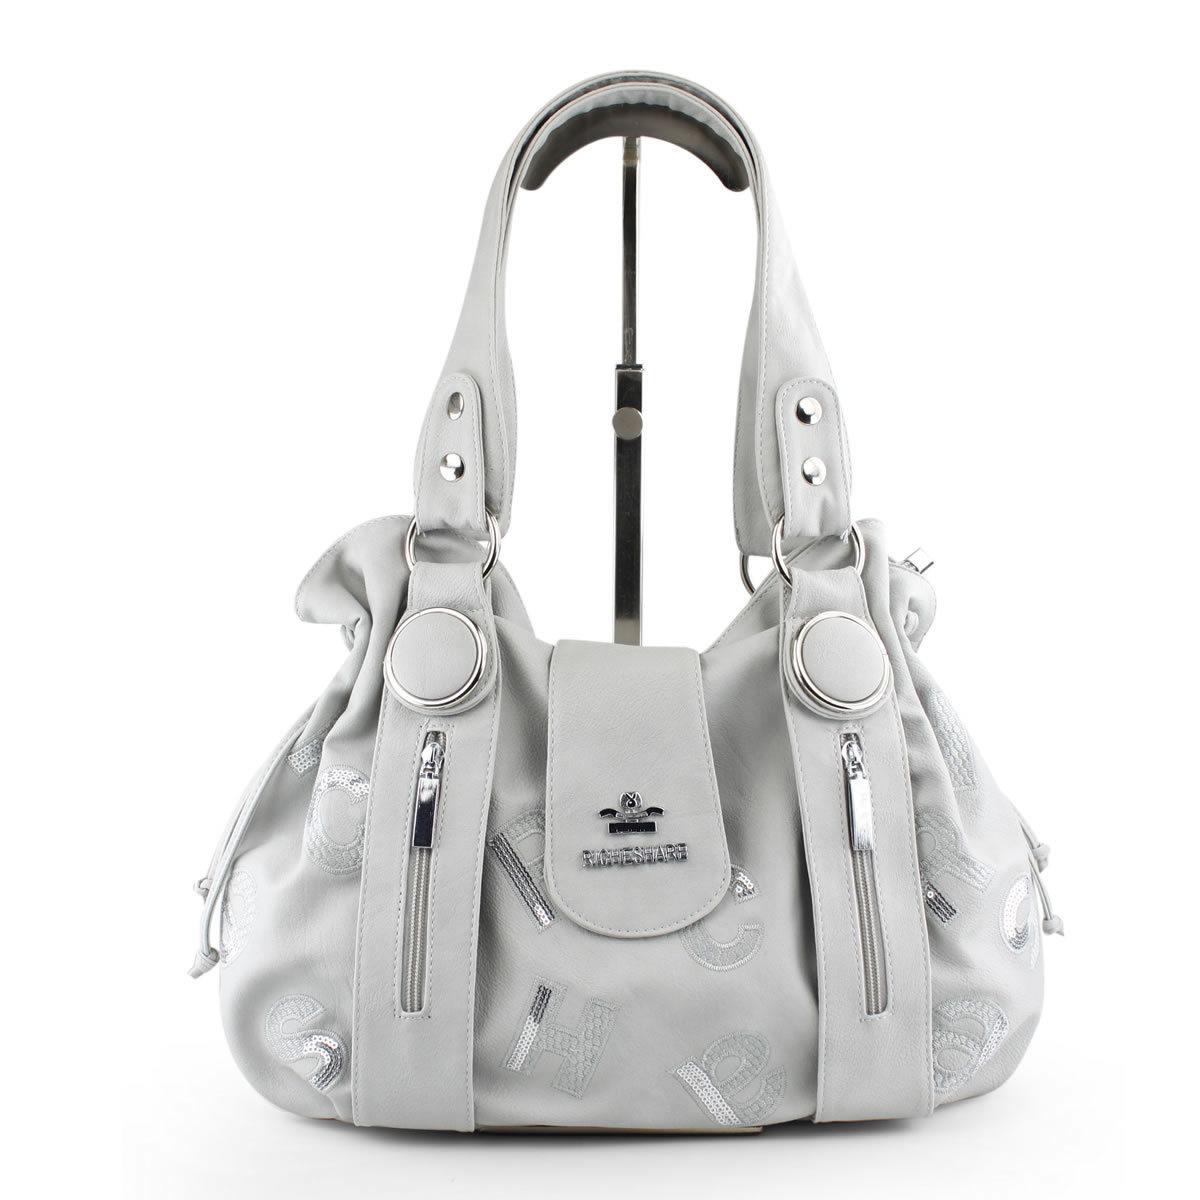 Fashion Handbags Wholesale Handbag Wholesale reatail